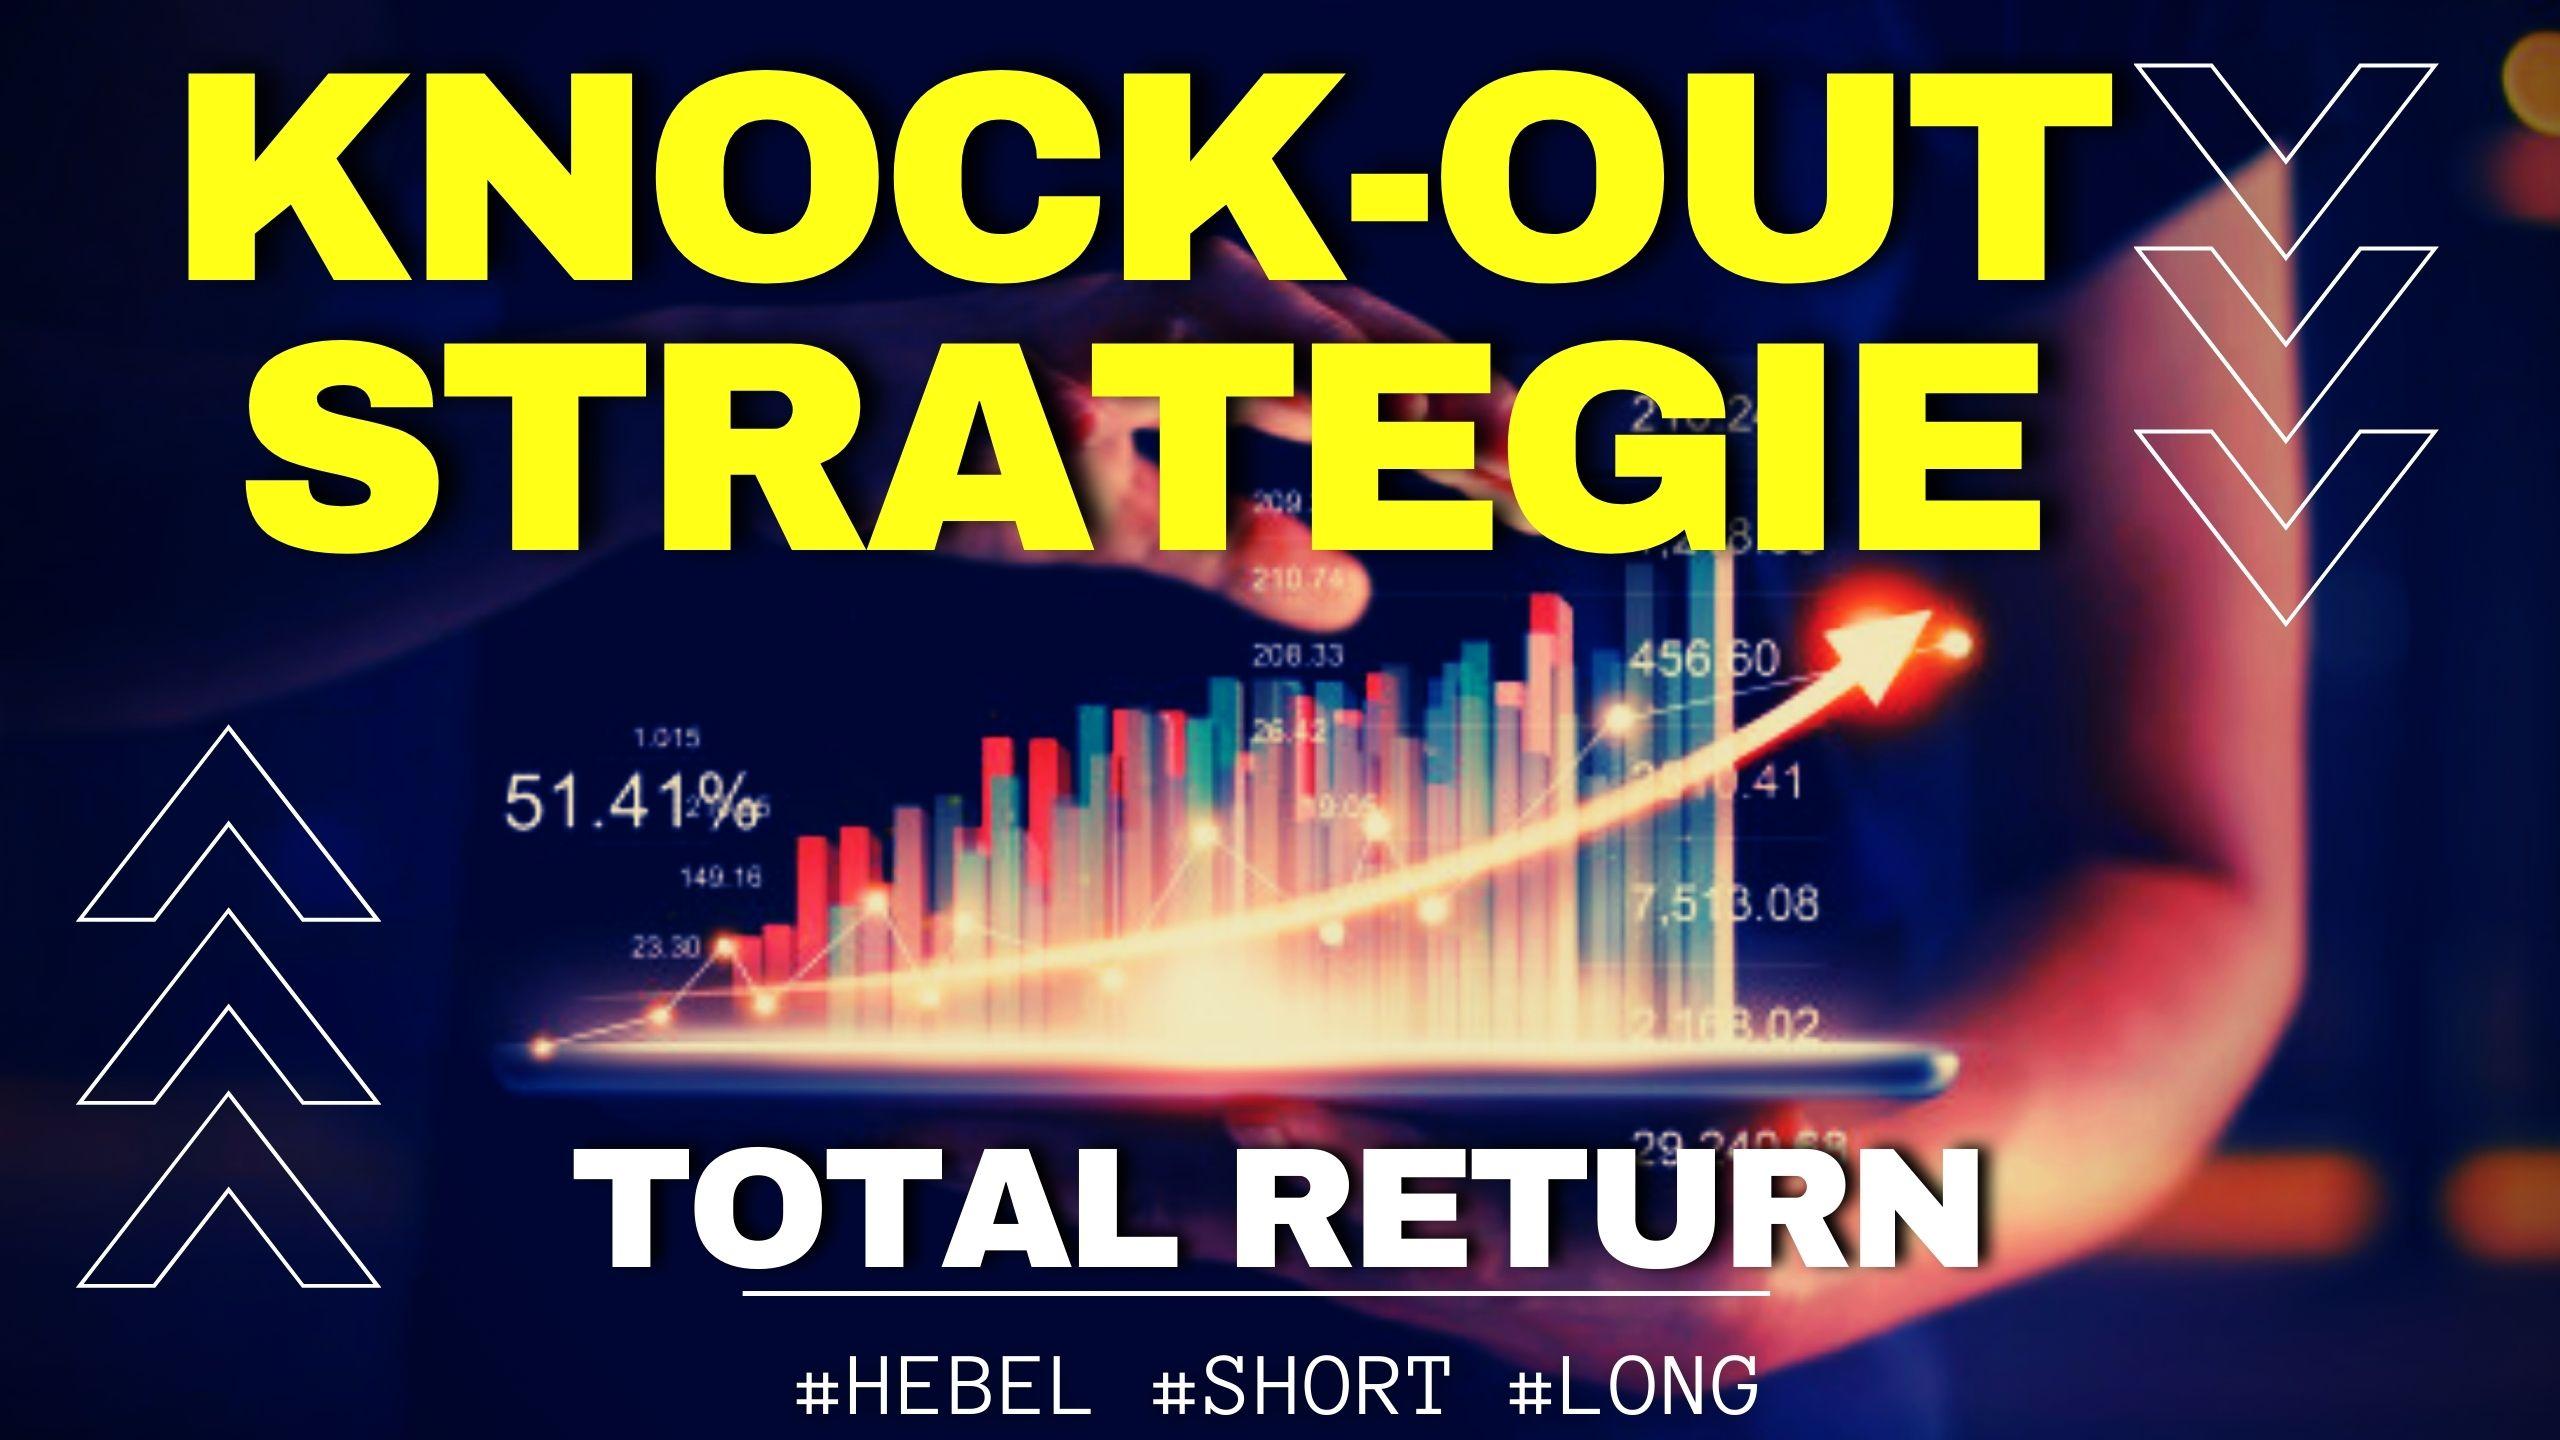 Knock Out Zertifikate - Strategie mit Total Return